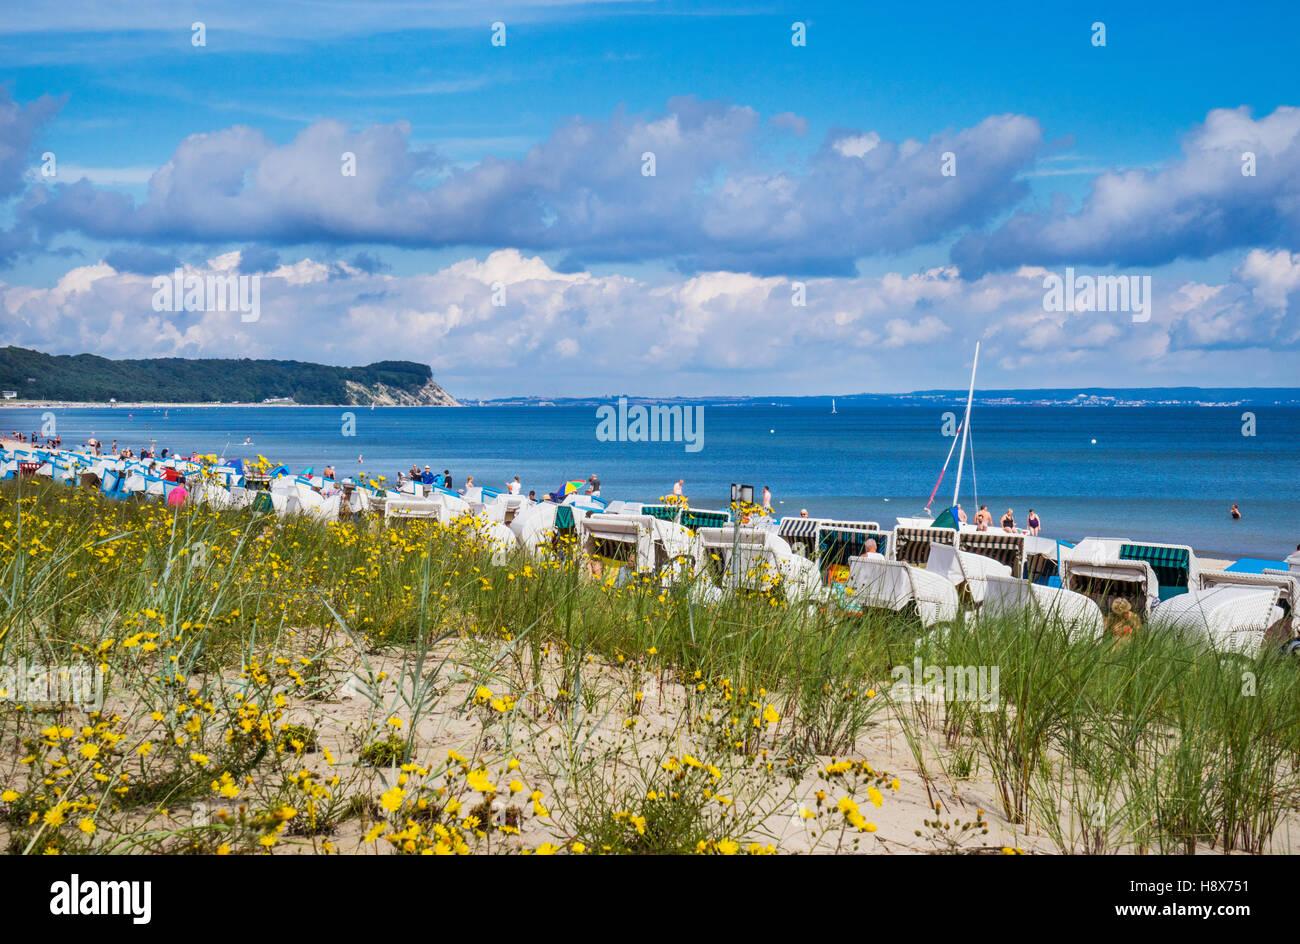 Strandkörbe (hooded beach chairs) on the beach of the Baltic Sea resort Göhren, Rügen, Mecklenburg - Stock Image